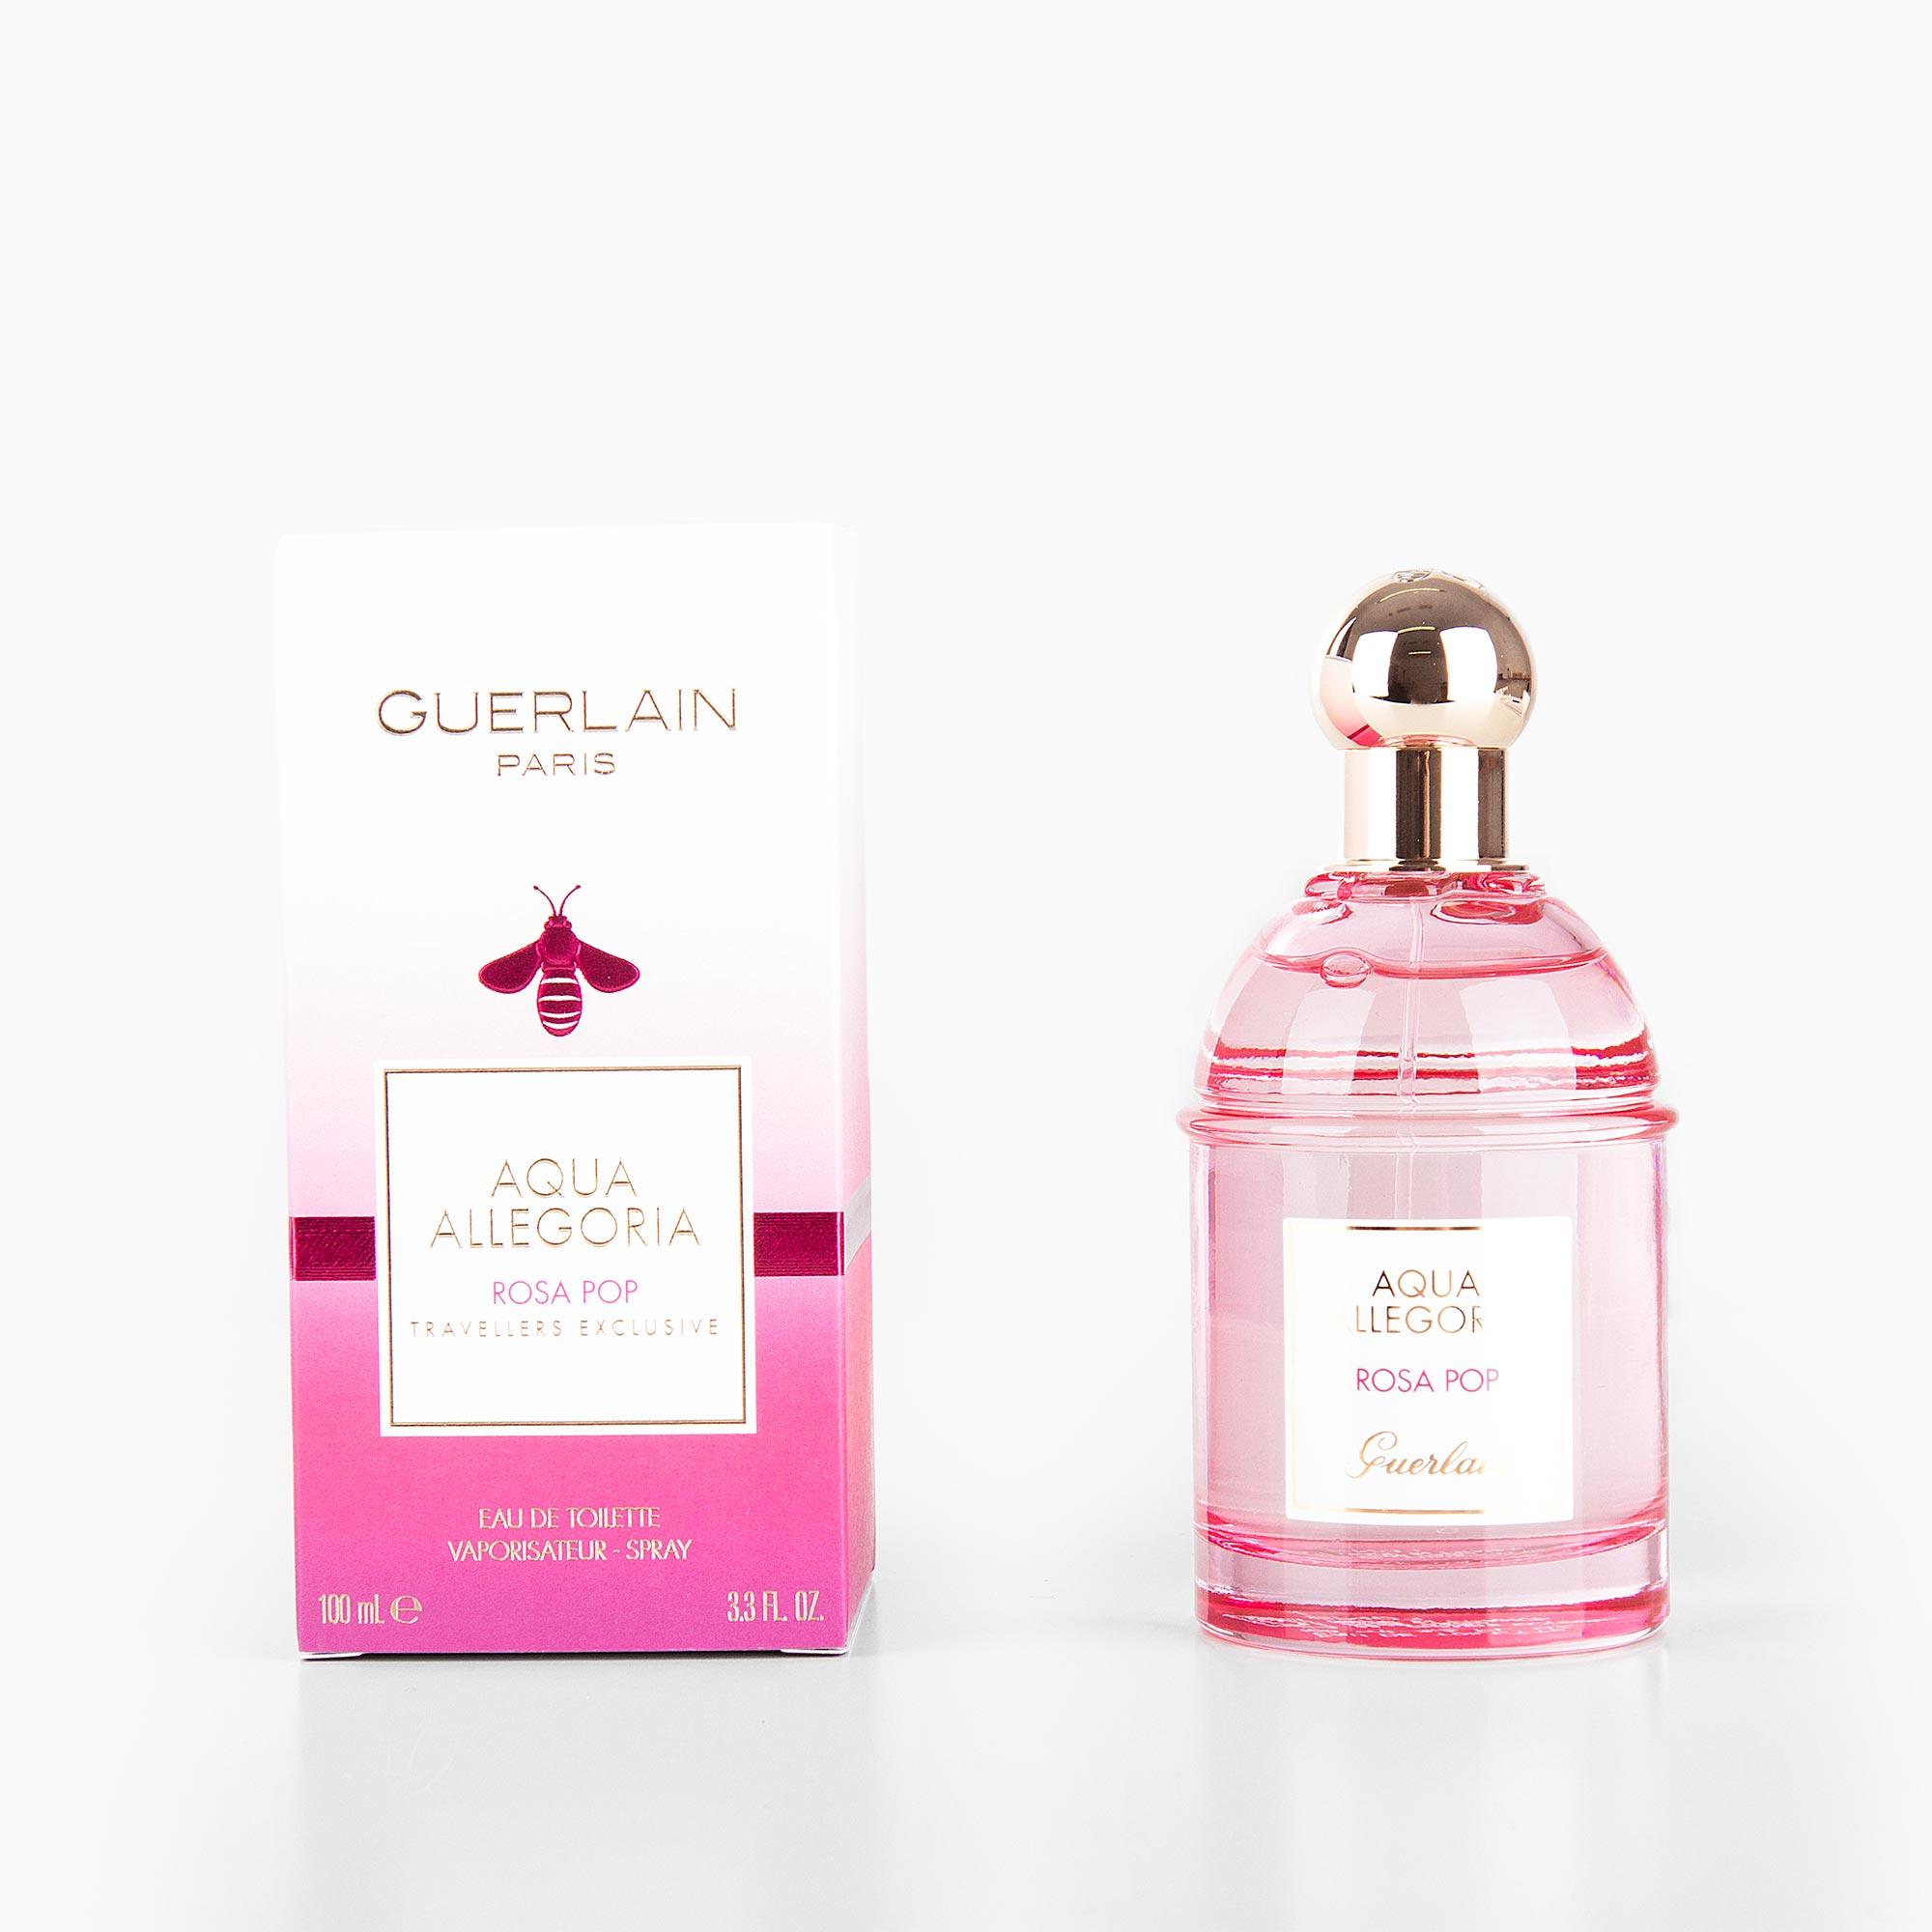 Parfum Pop De Allegoria Rosa Guerlain Femme Toilette Aqua Eau 100ml qMpUzSV